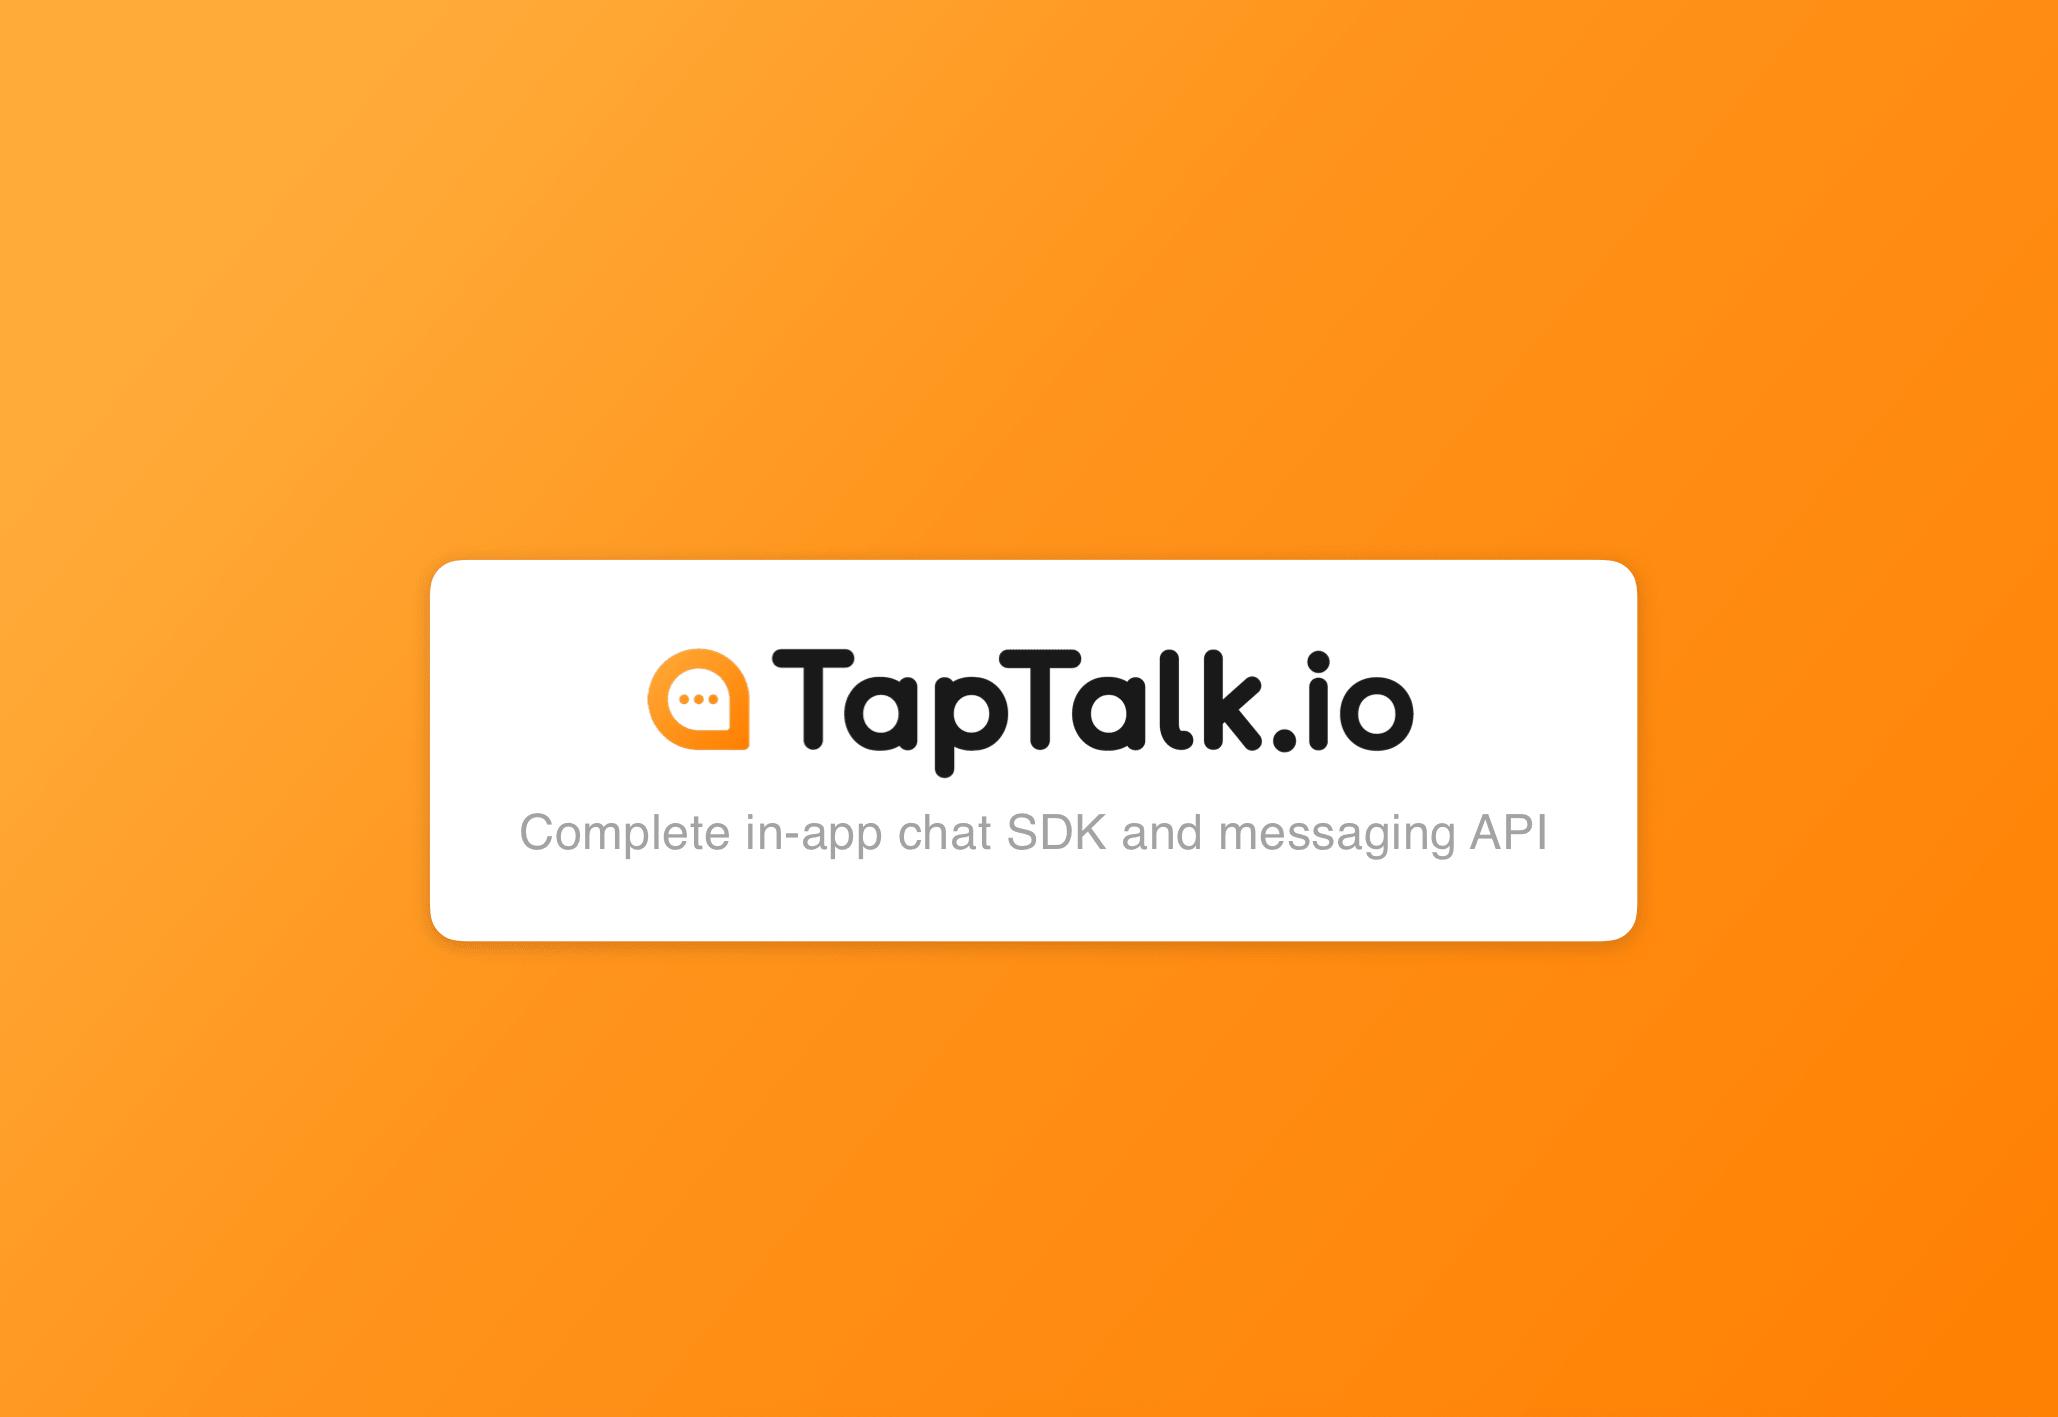 TapTalk.io Aplikasi Chat Buatan Anak Bangsa Ini Siap Saingi Aplikasi Chat  Global